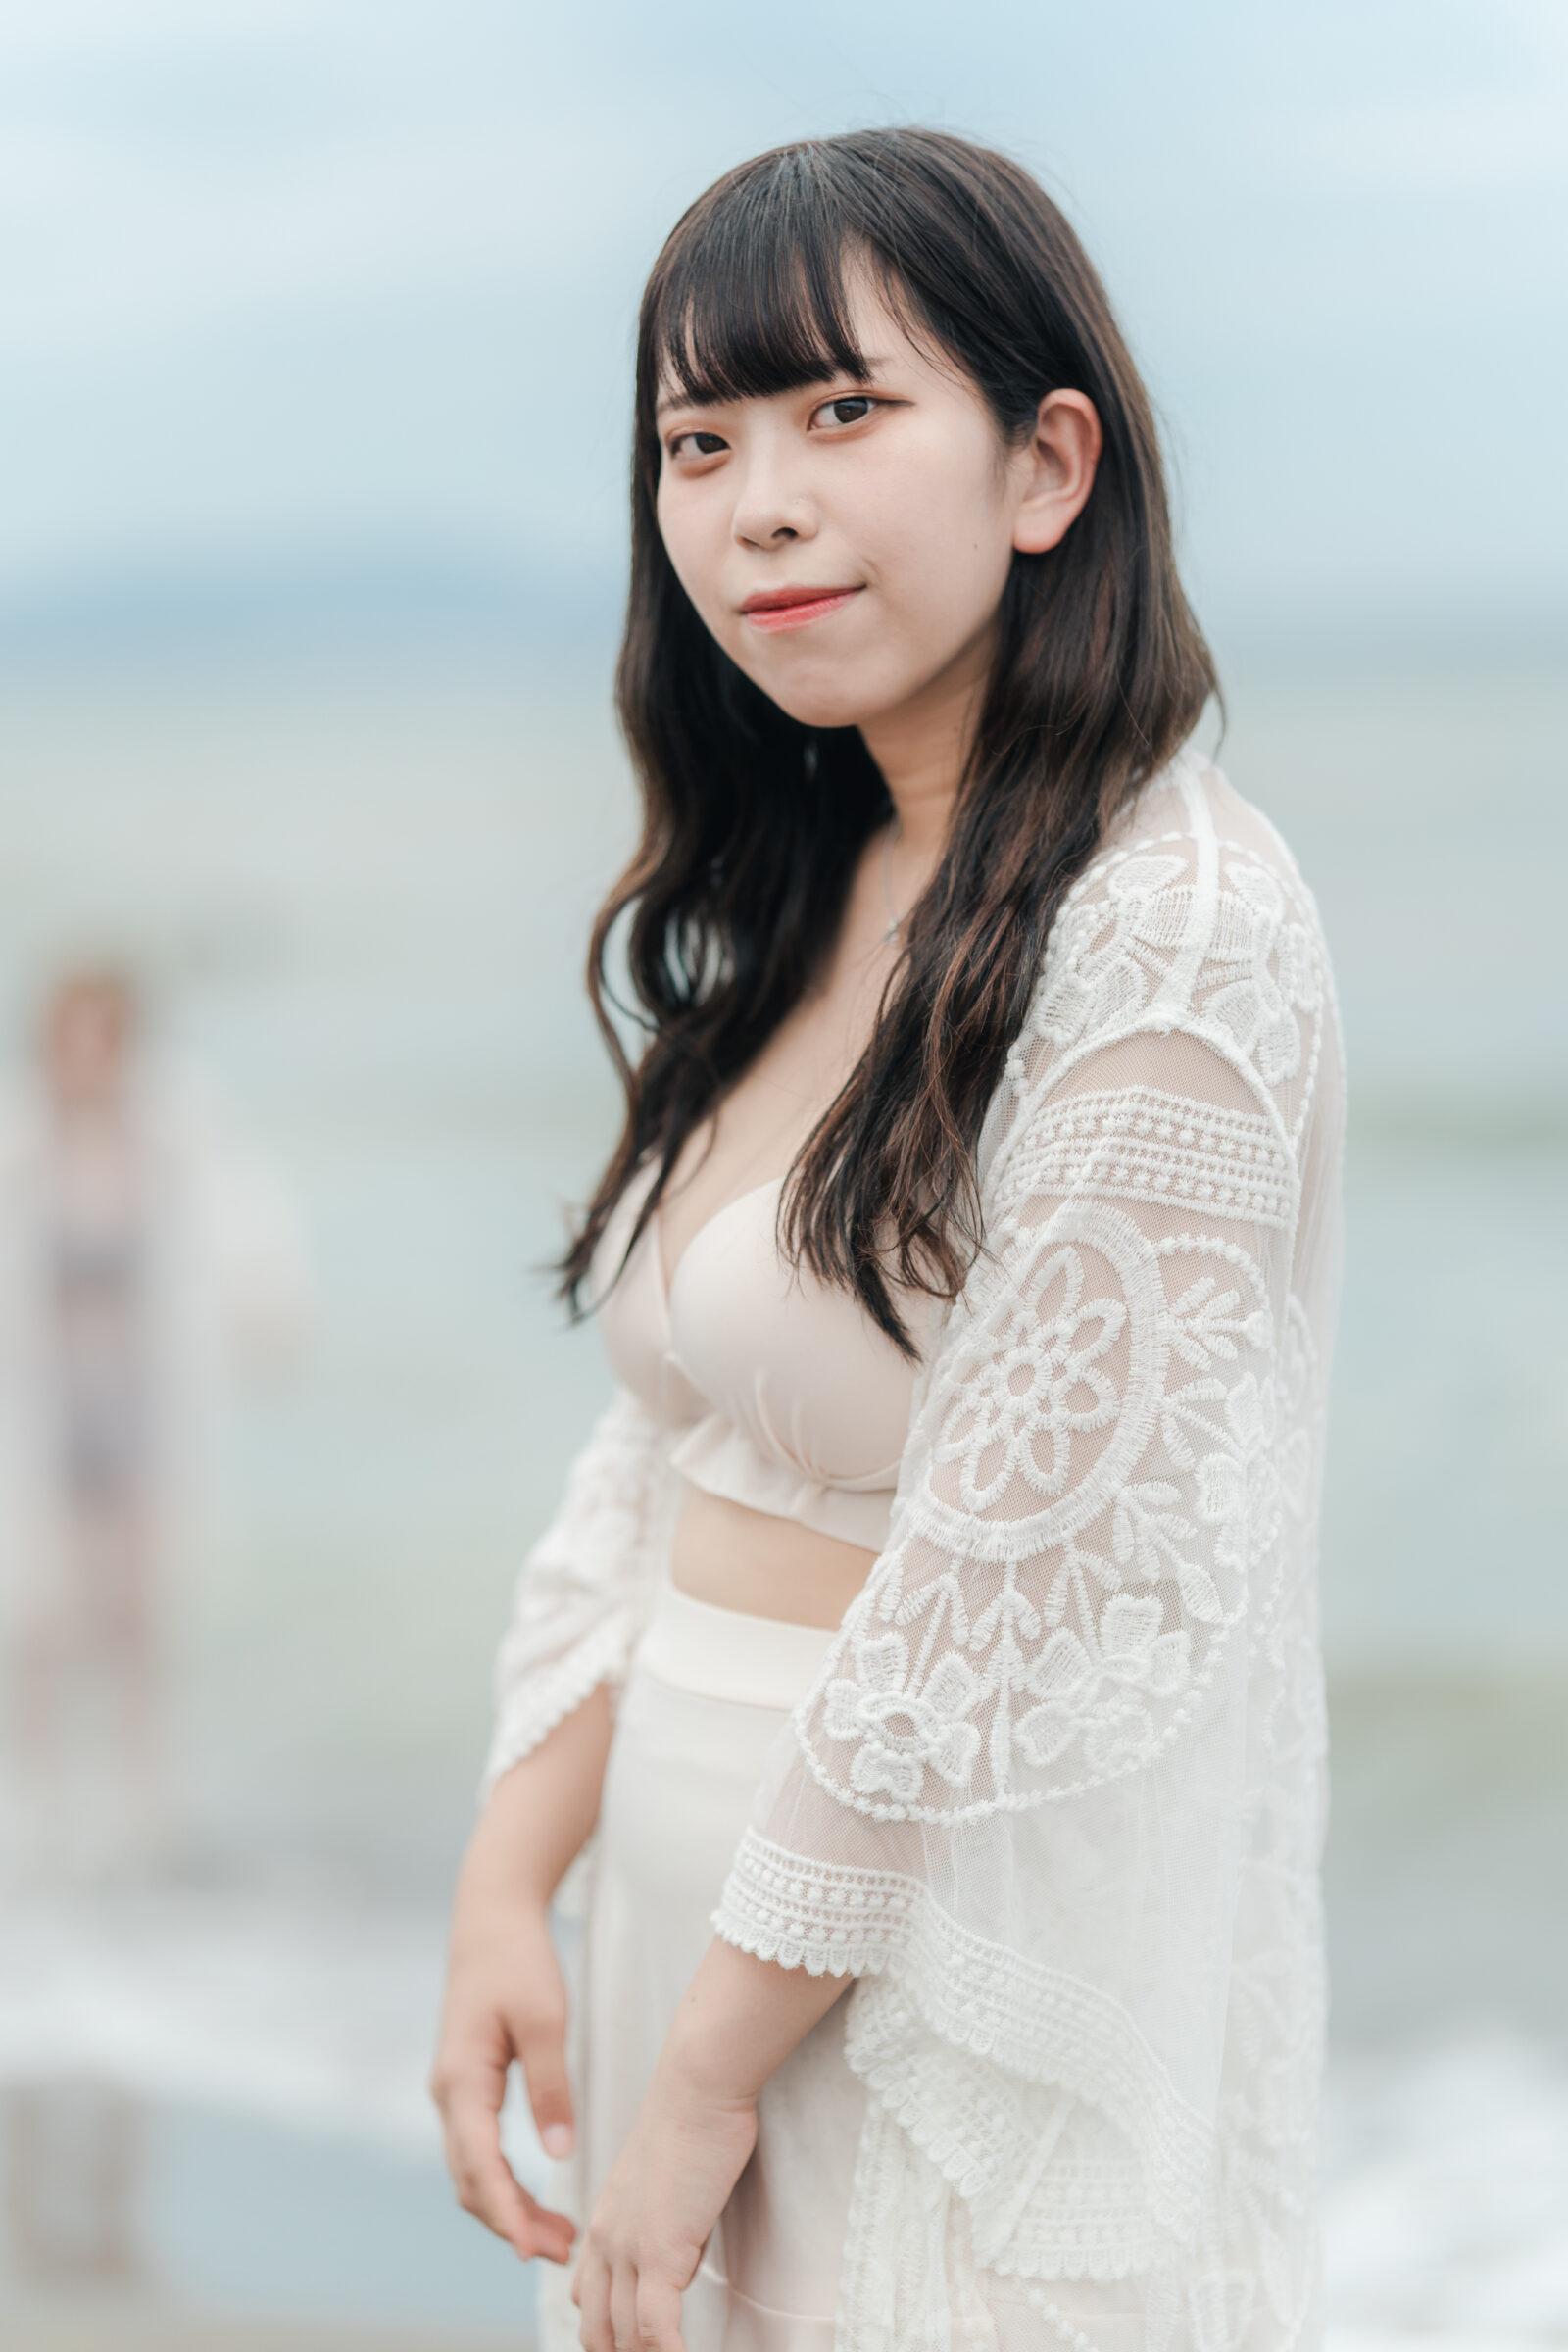 HAPPY少女♪ ここあ ( 麦谷心愛 ) | ライブプロ海イベント2021水着撮影会